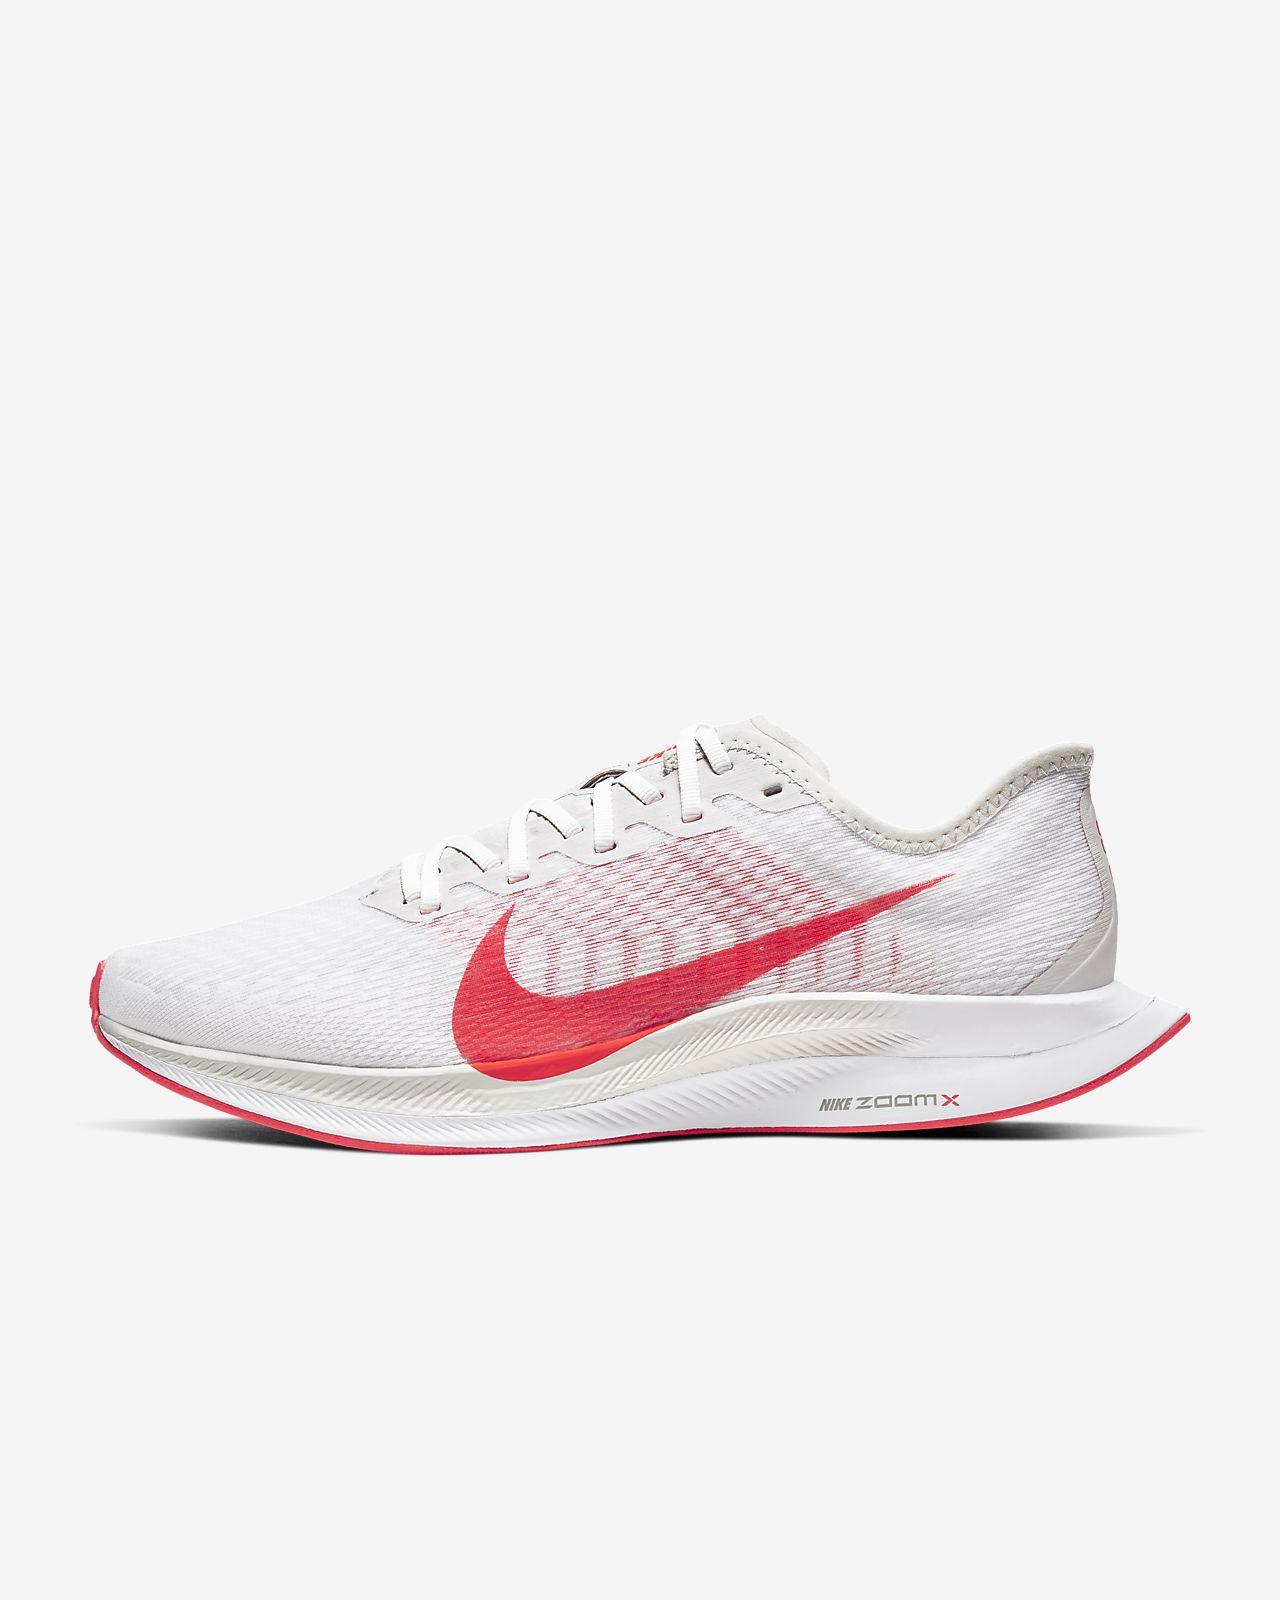 Nike Zoom Pegasus Turbo 2 Herren-Laufschuh